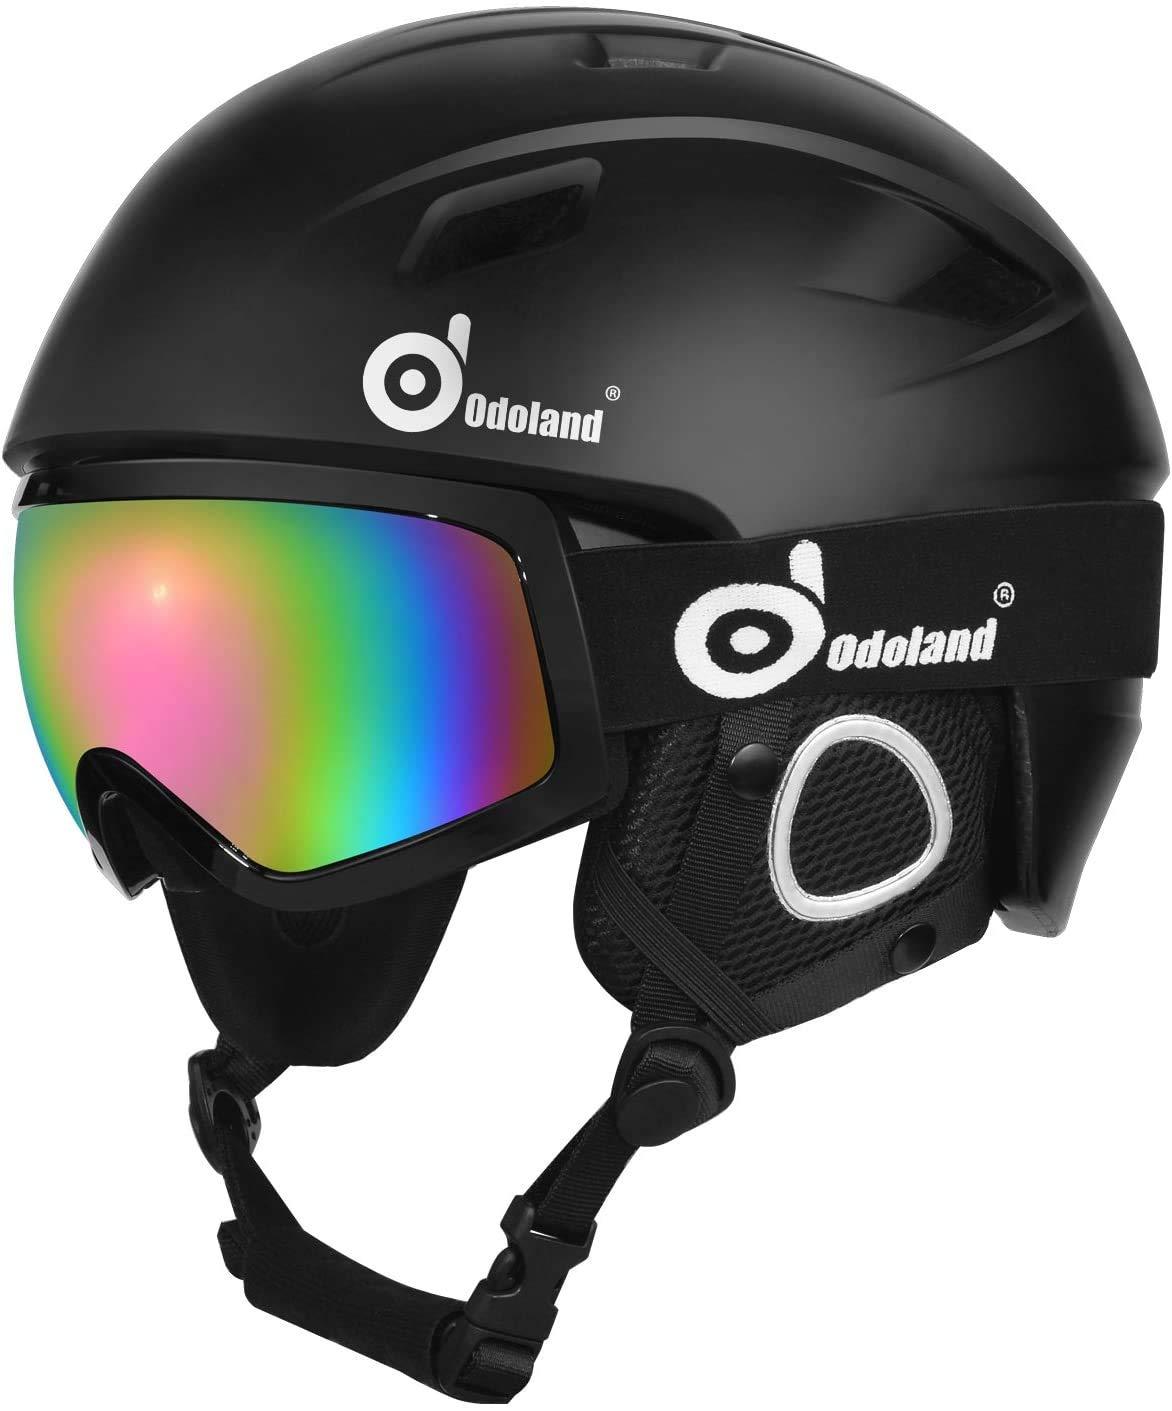 Odoland Snow Ski Helmet and Goggles Set